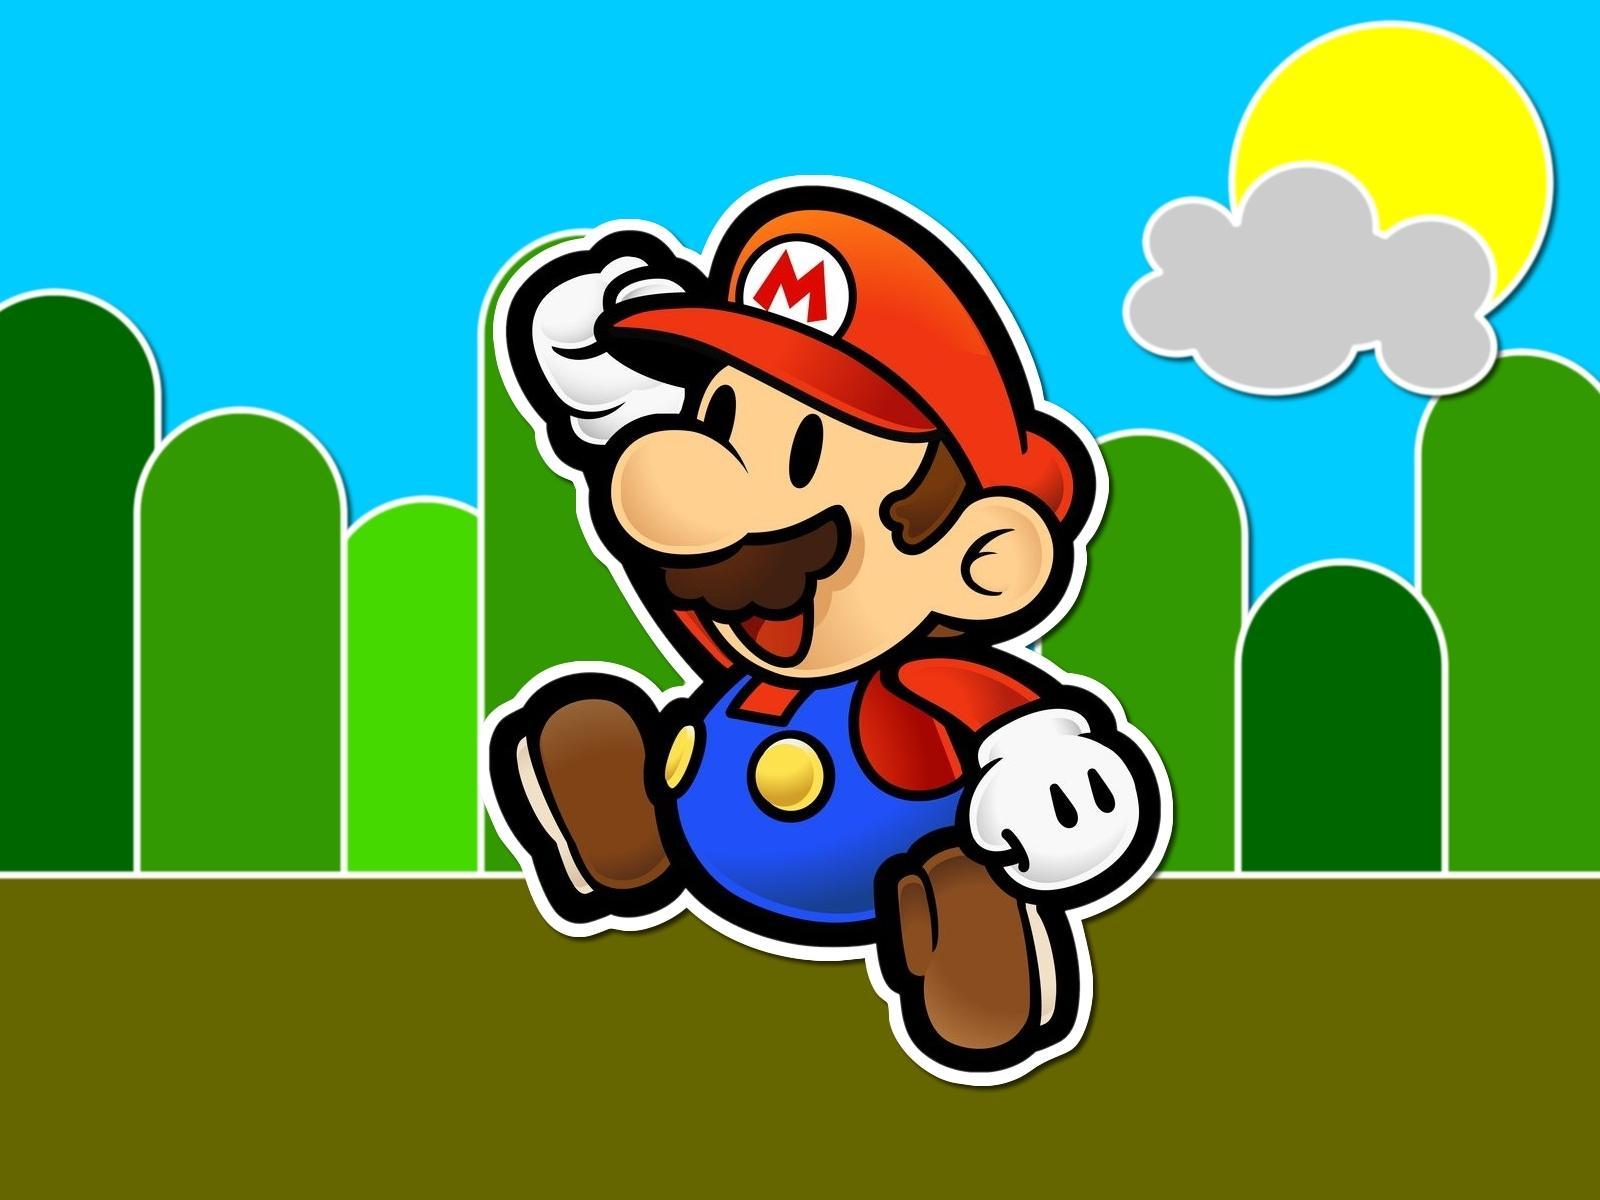 Mario Bros Wallpapers Top Free Mario Bros Backgrounds